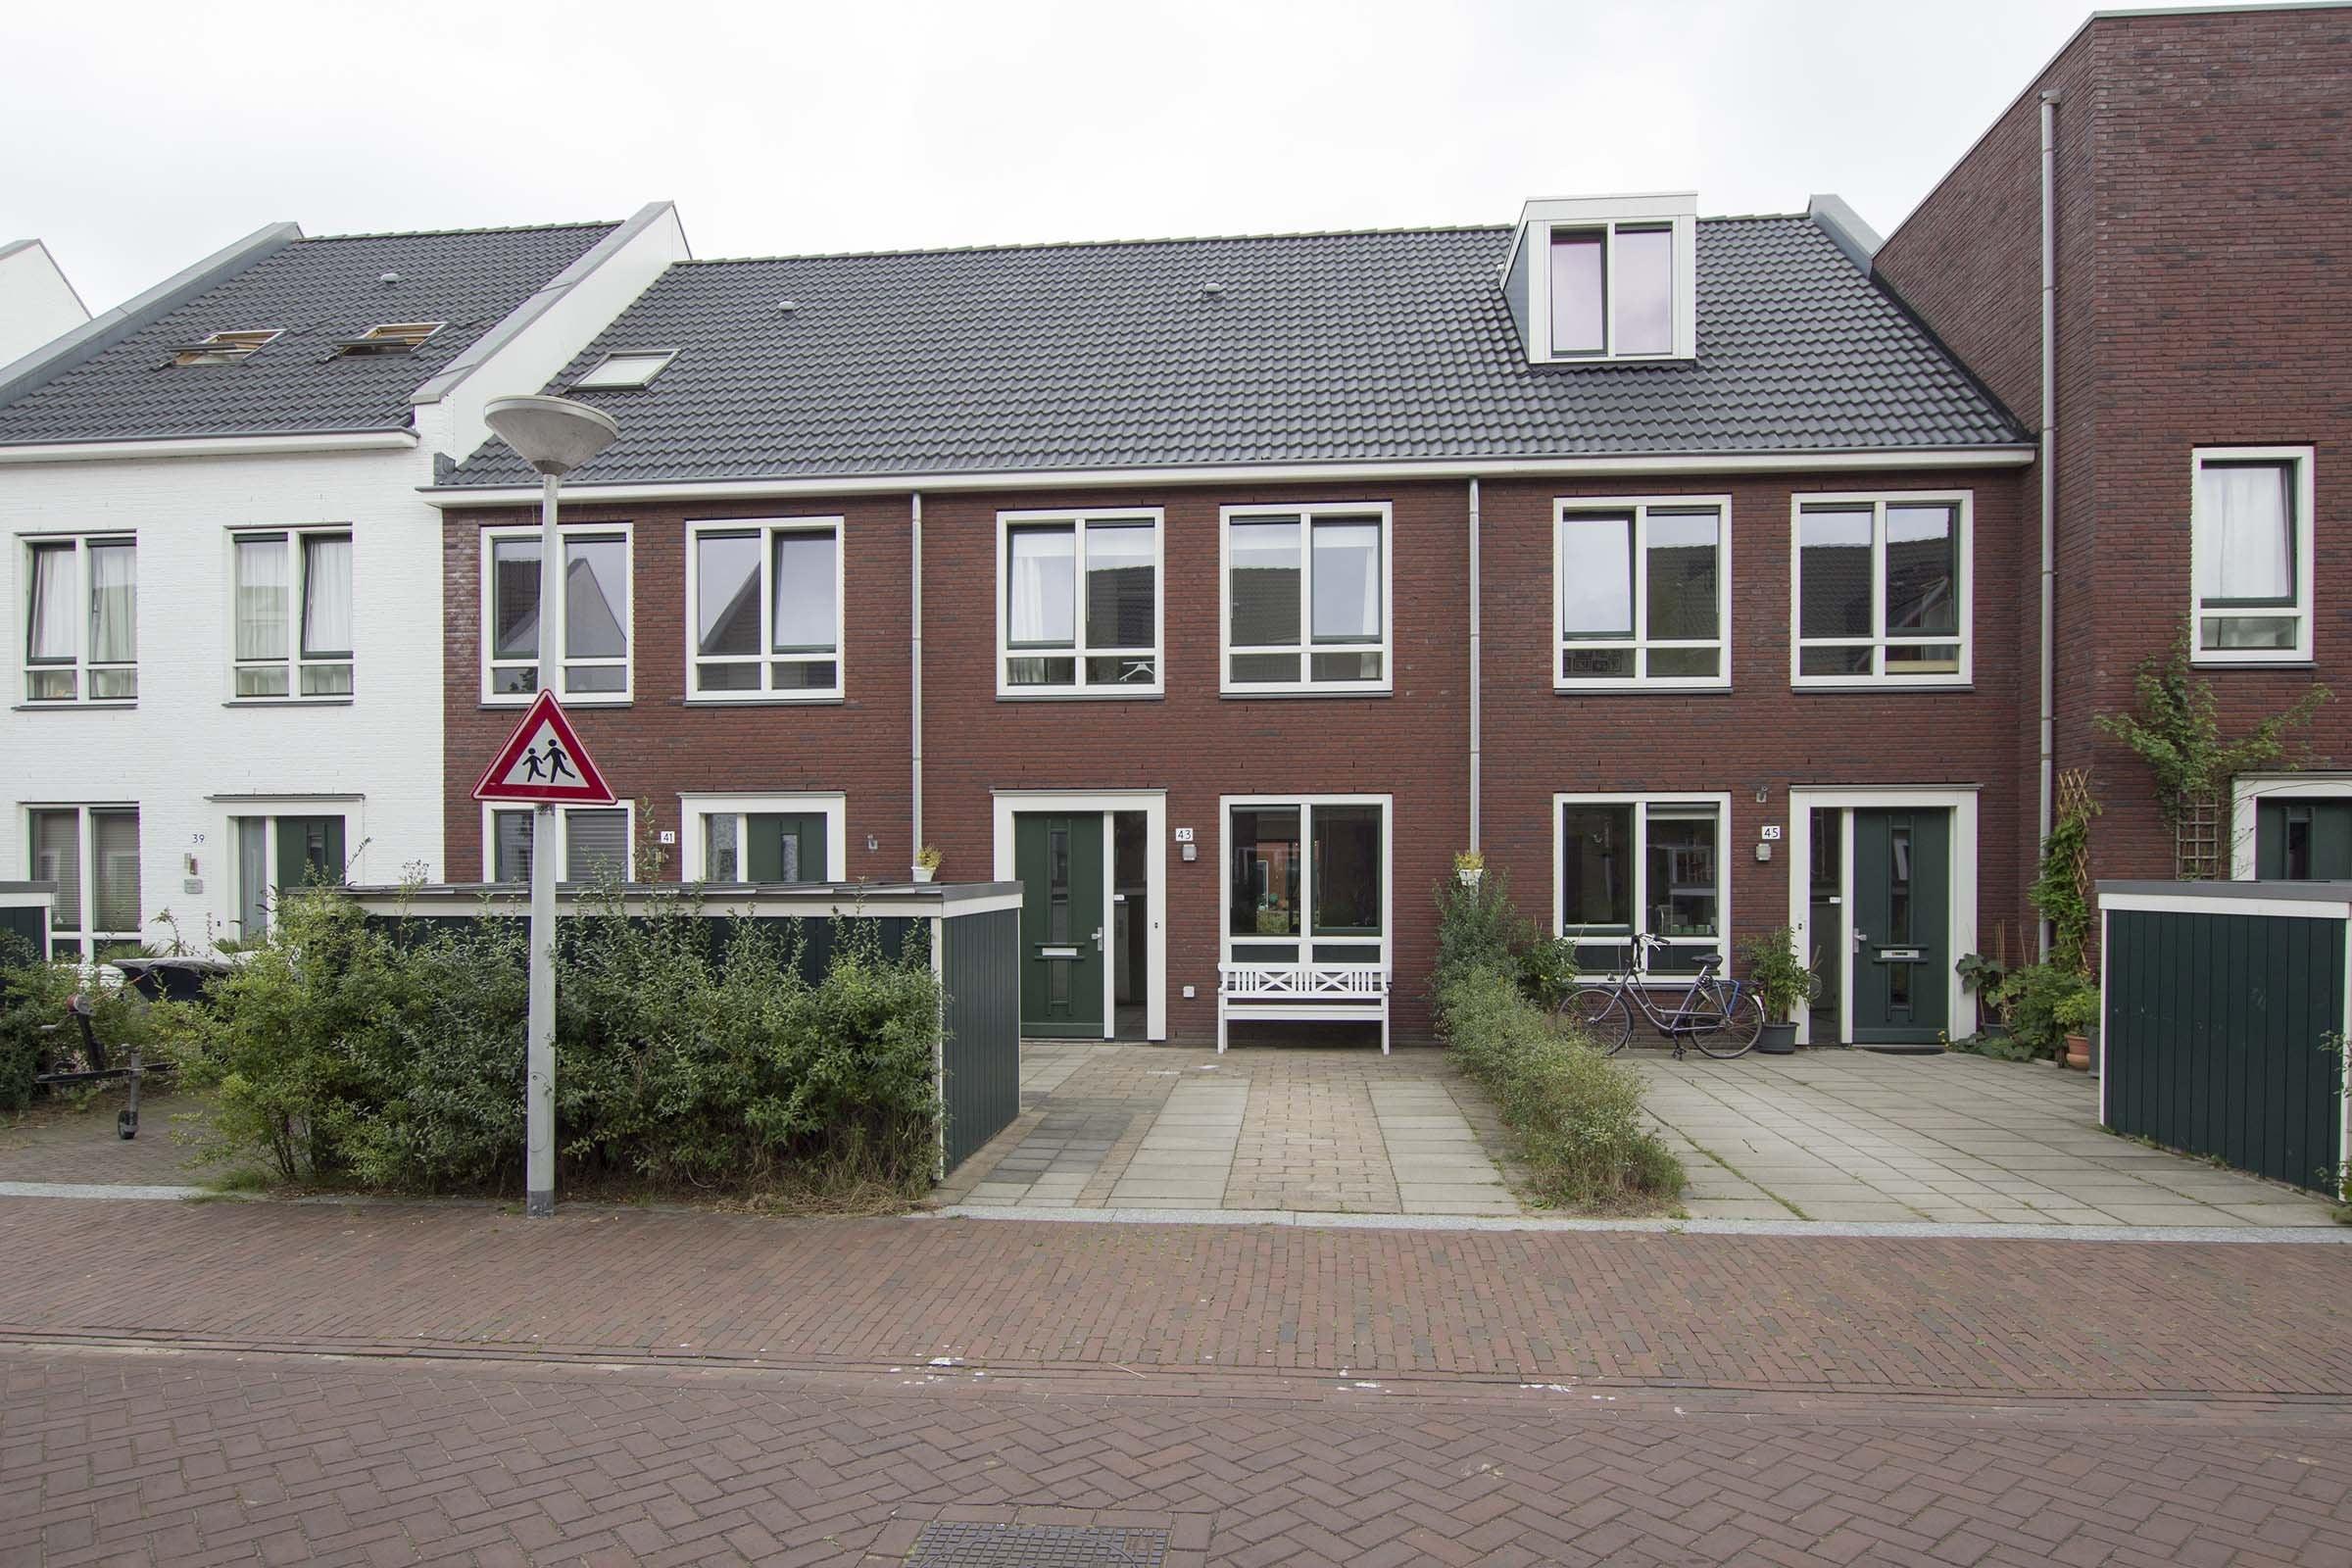 Amsterdam, C. Kruyswijkstraat